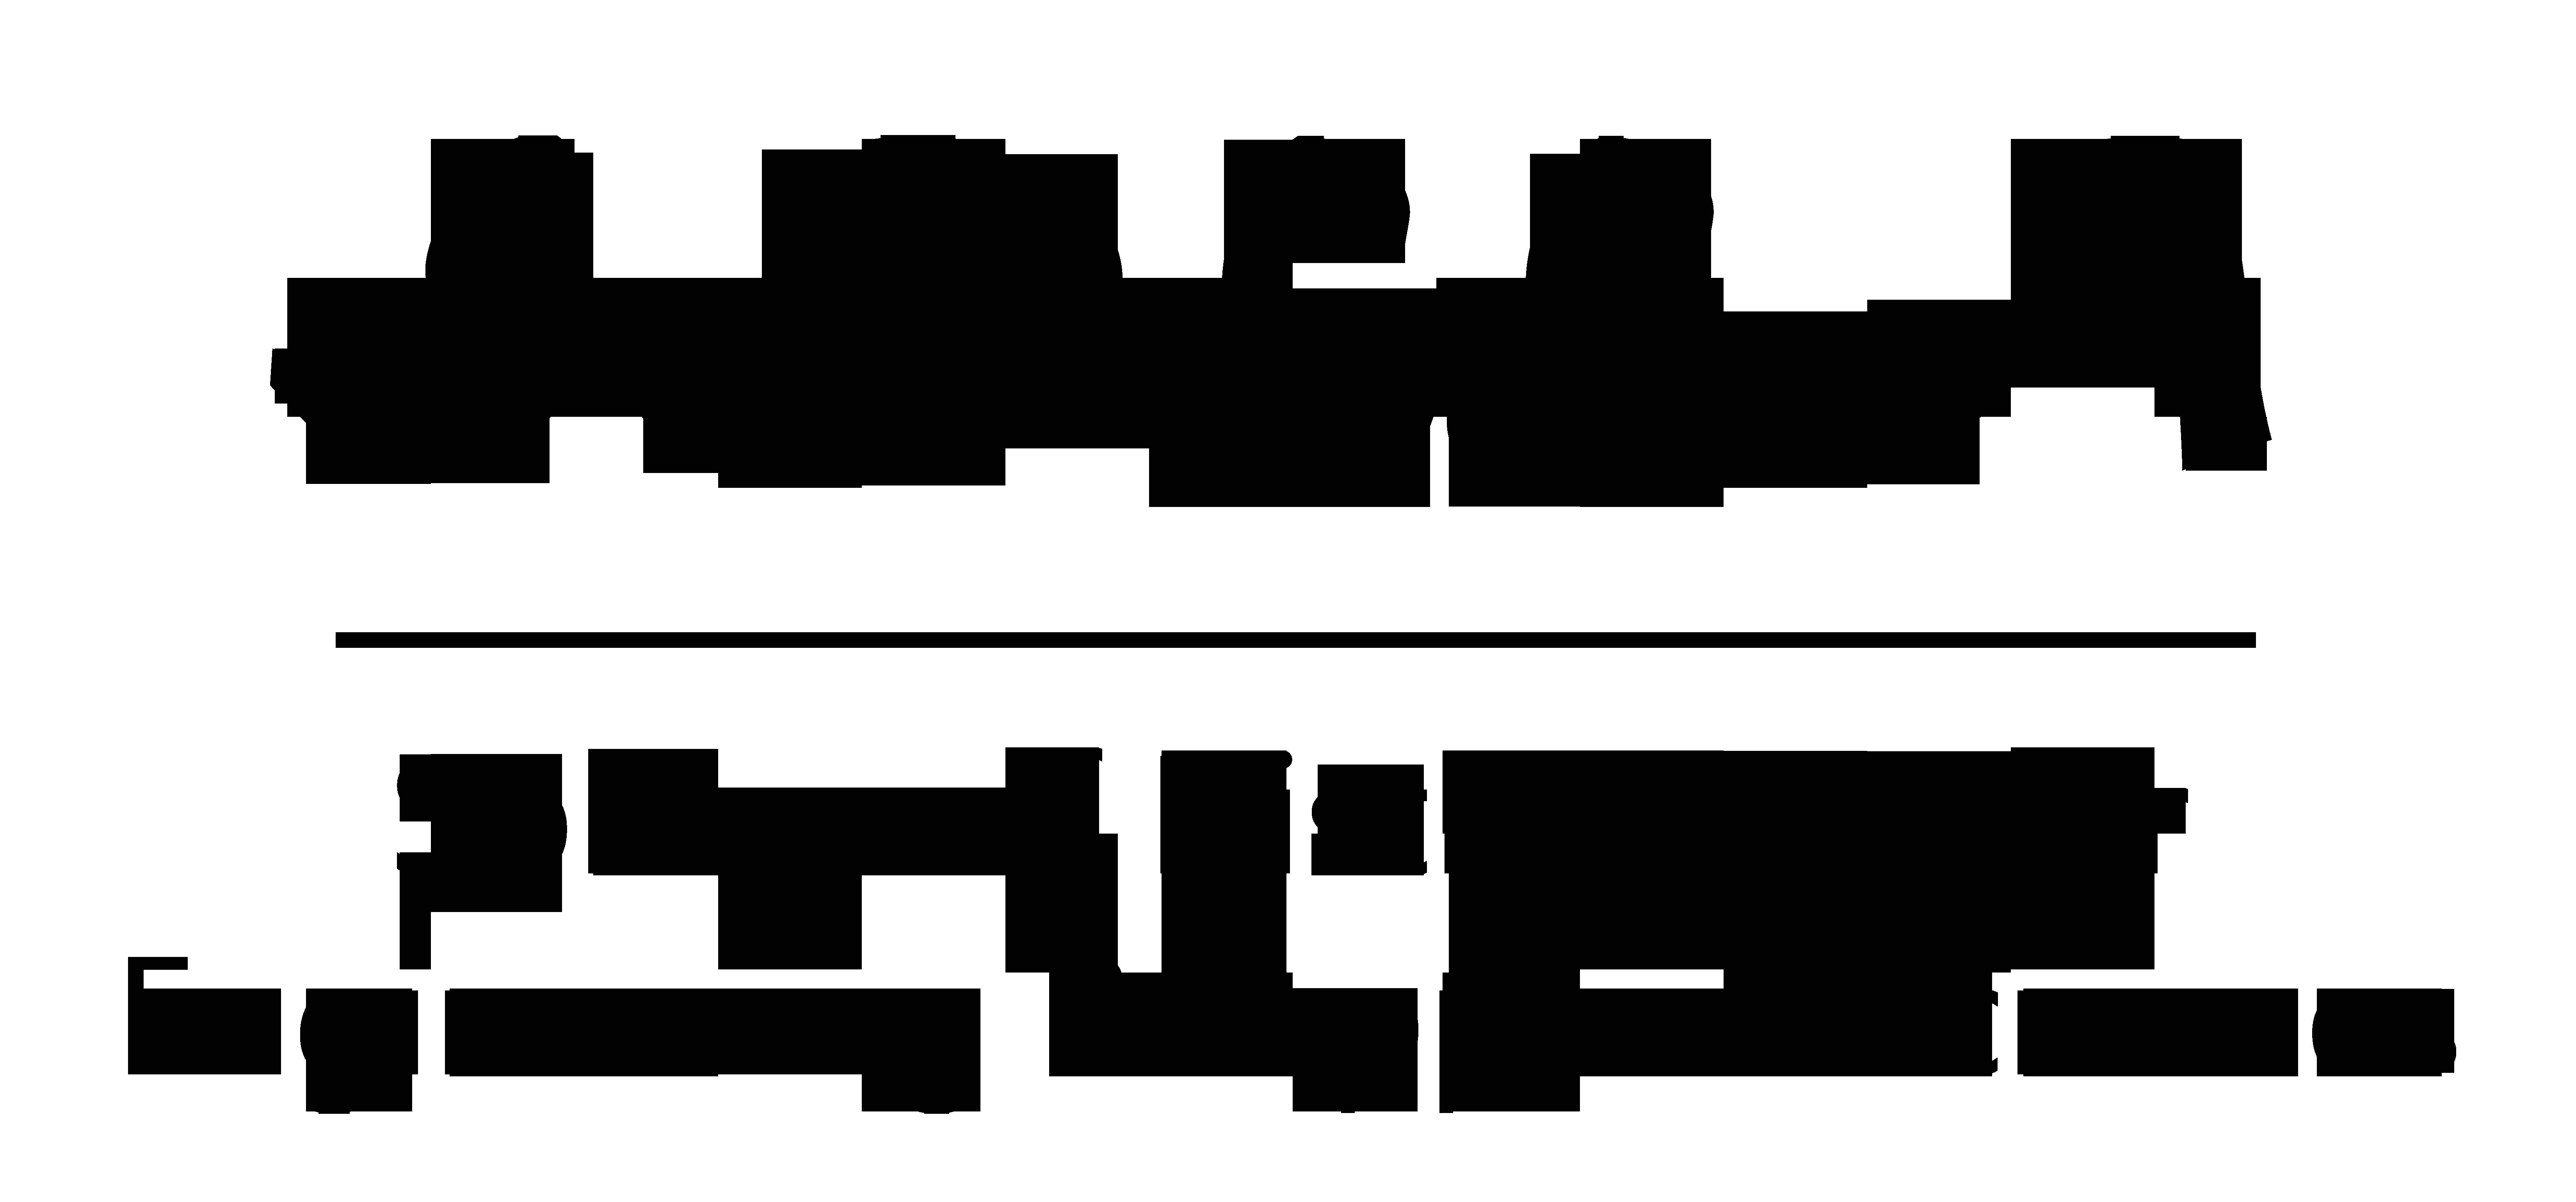 2nd International Conference On Engineering Design Control Technology Robotics And Automation Edctr 2020 Dubai Uae Conferences Vepub